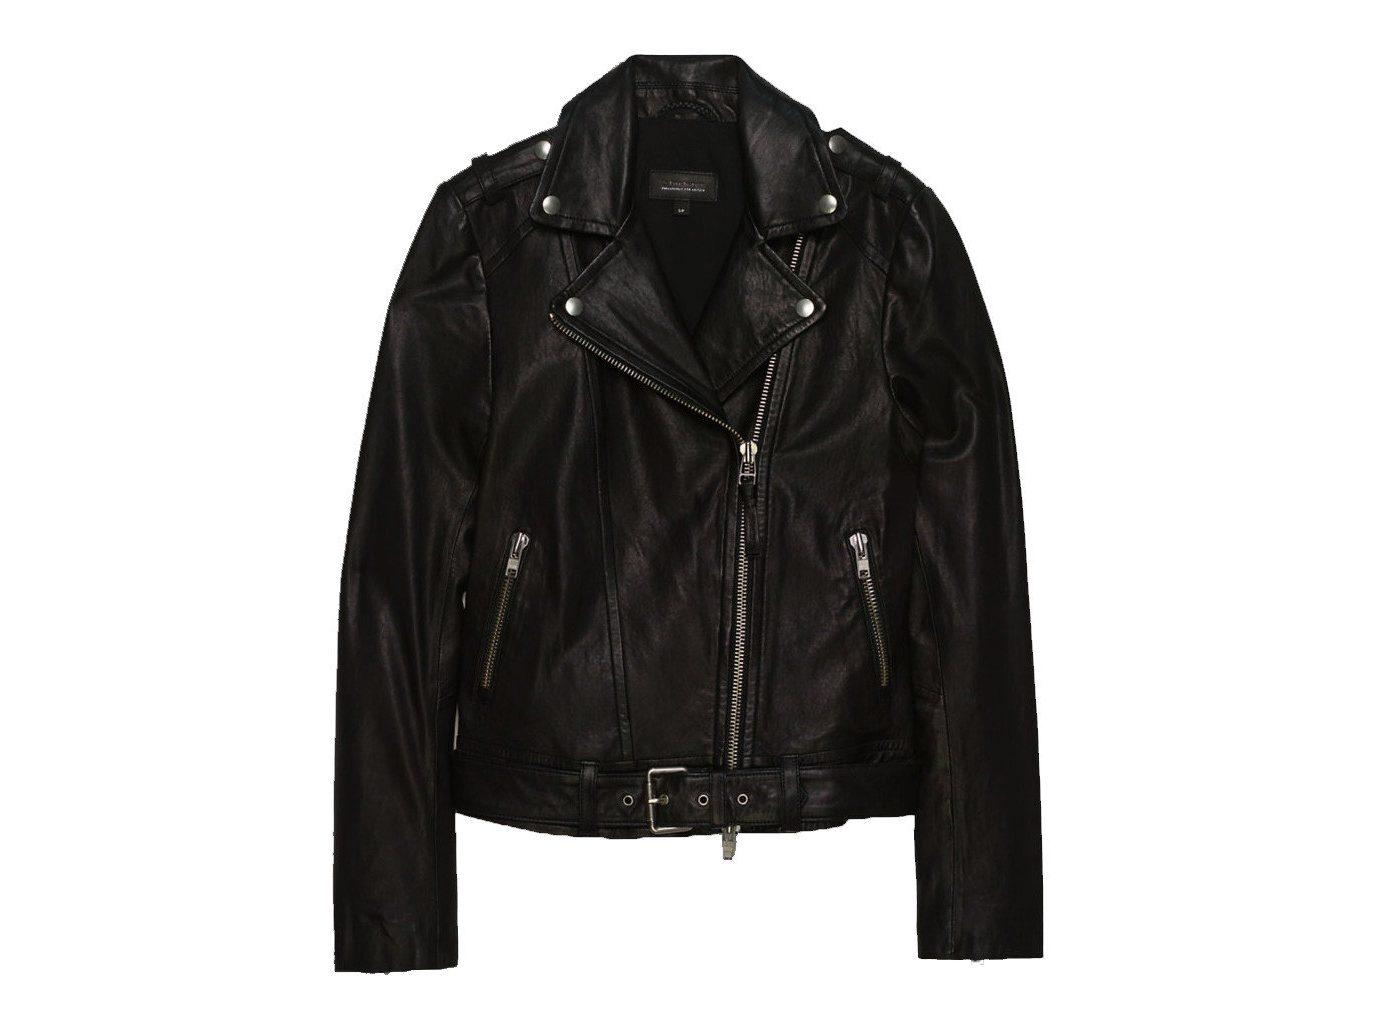 Style + Design jacket clothing leather jacket leather black textile material outerwear coat sleeve